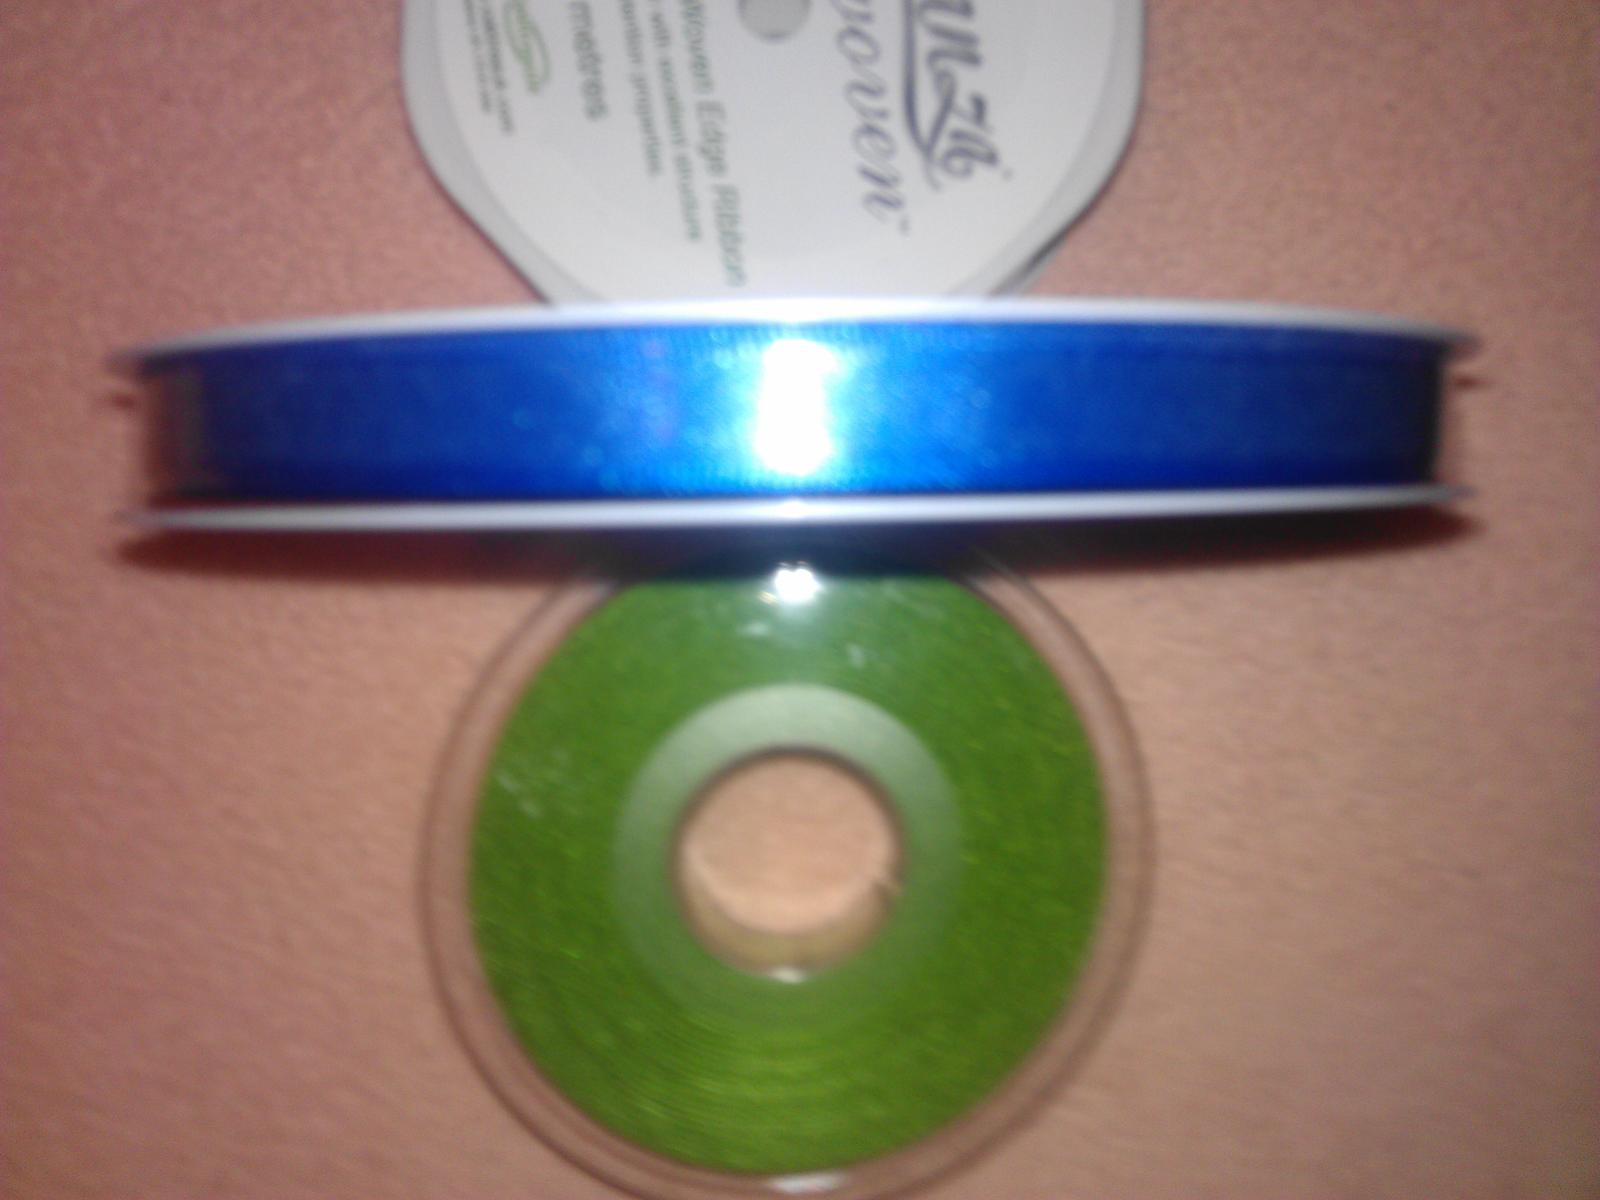 obojstranna satenova stuha sirka 10 mm - Obrázok č. 1